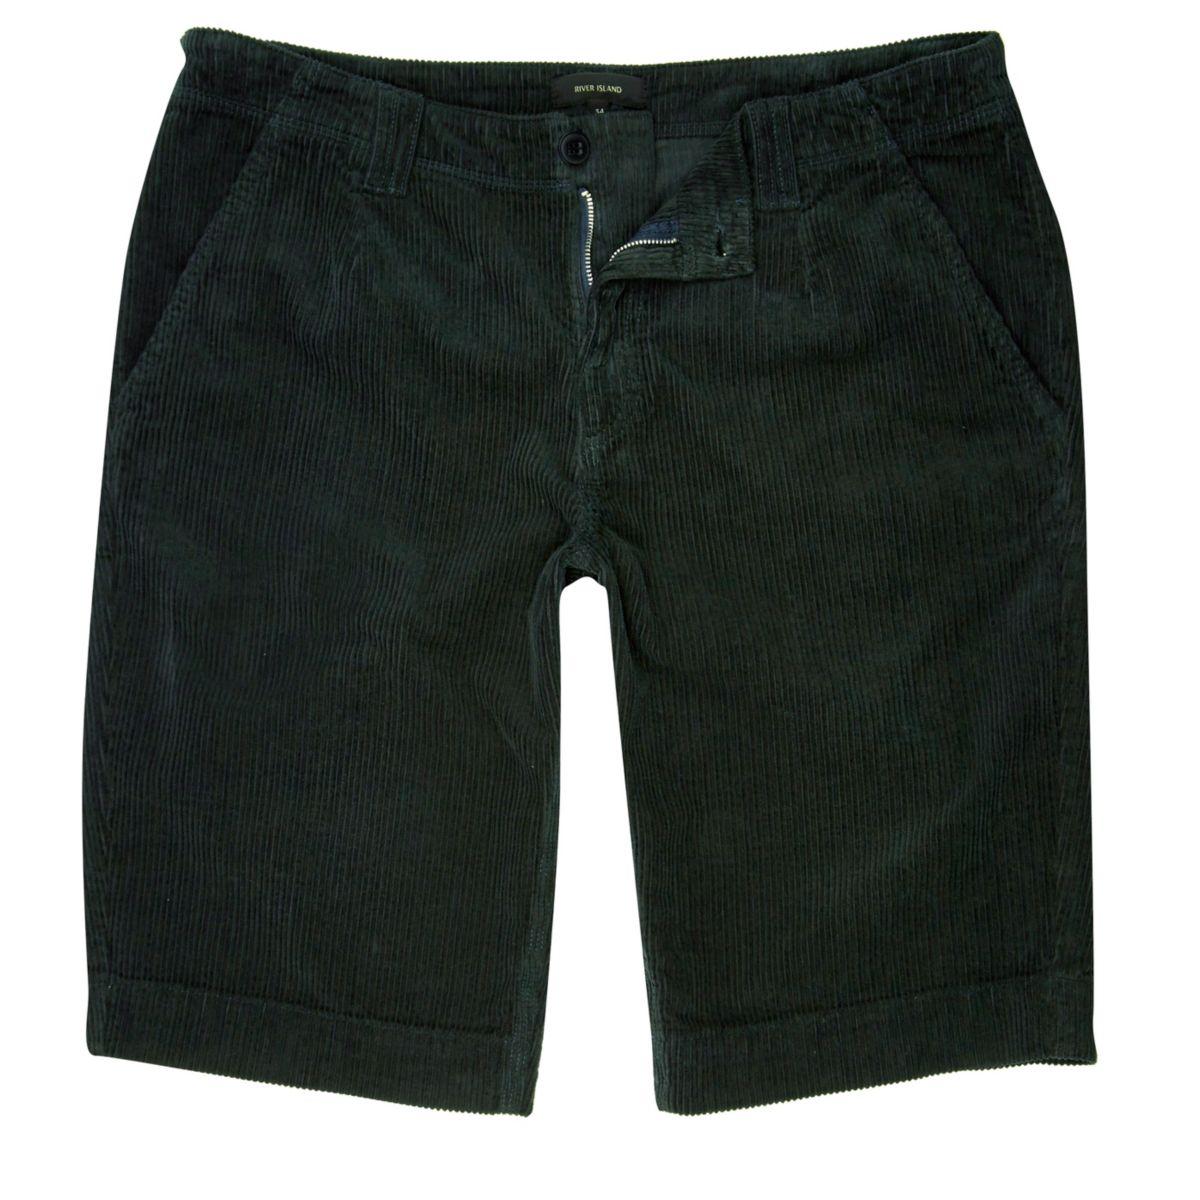 Dark Green Cord Slim Fit Shorts by River Island